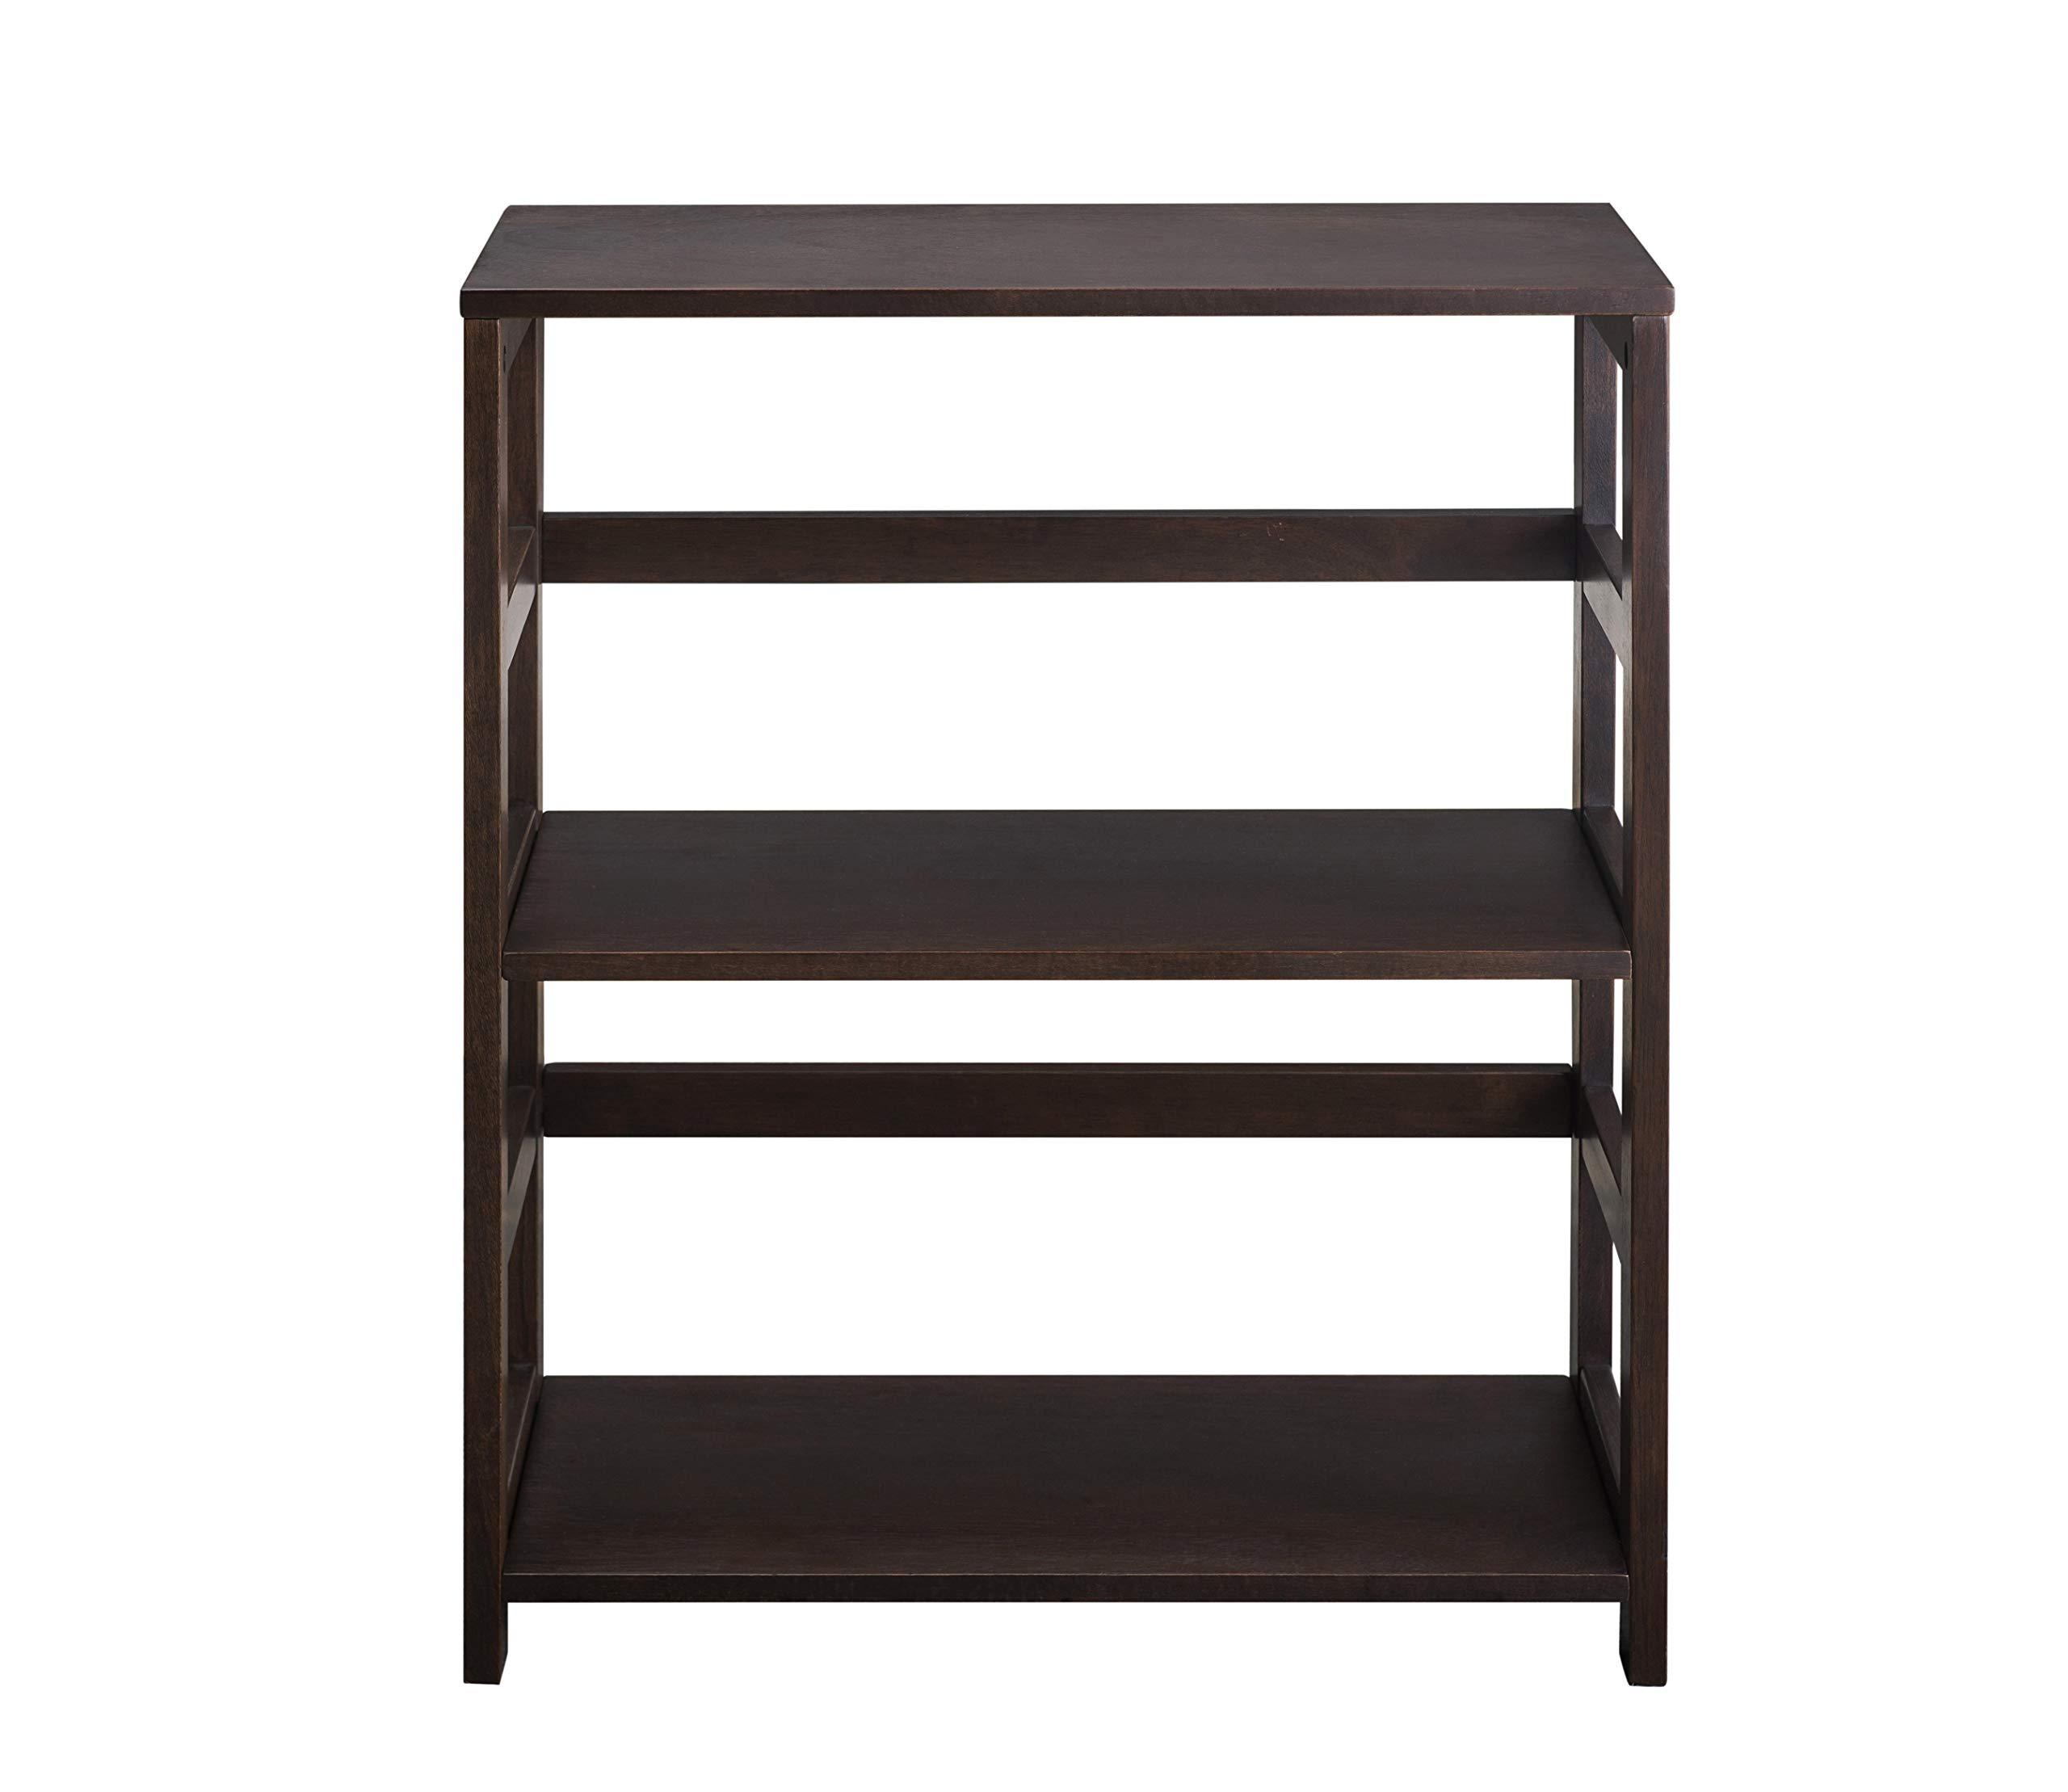 2L Lifestyle Hyder Everyday Basic Bookshelf Storage Rack Wood Shelf, Small, Brown by 2L Lifestyle (Image #4)